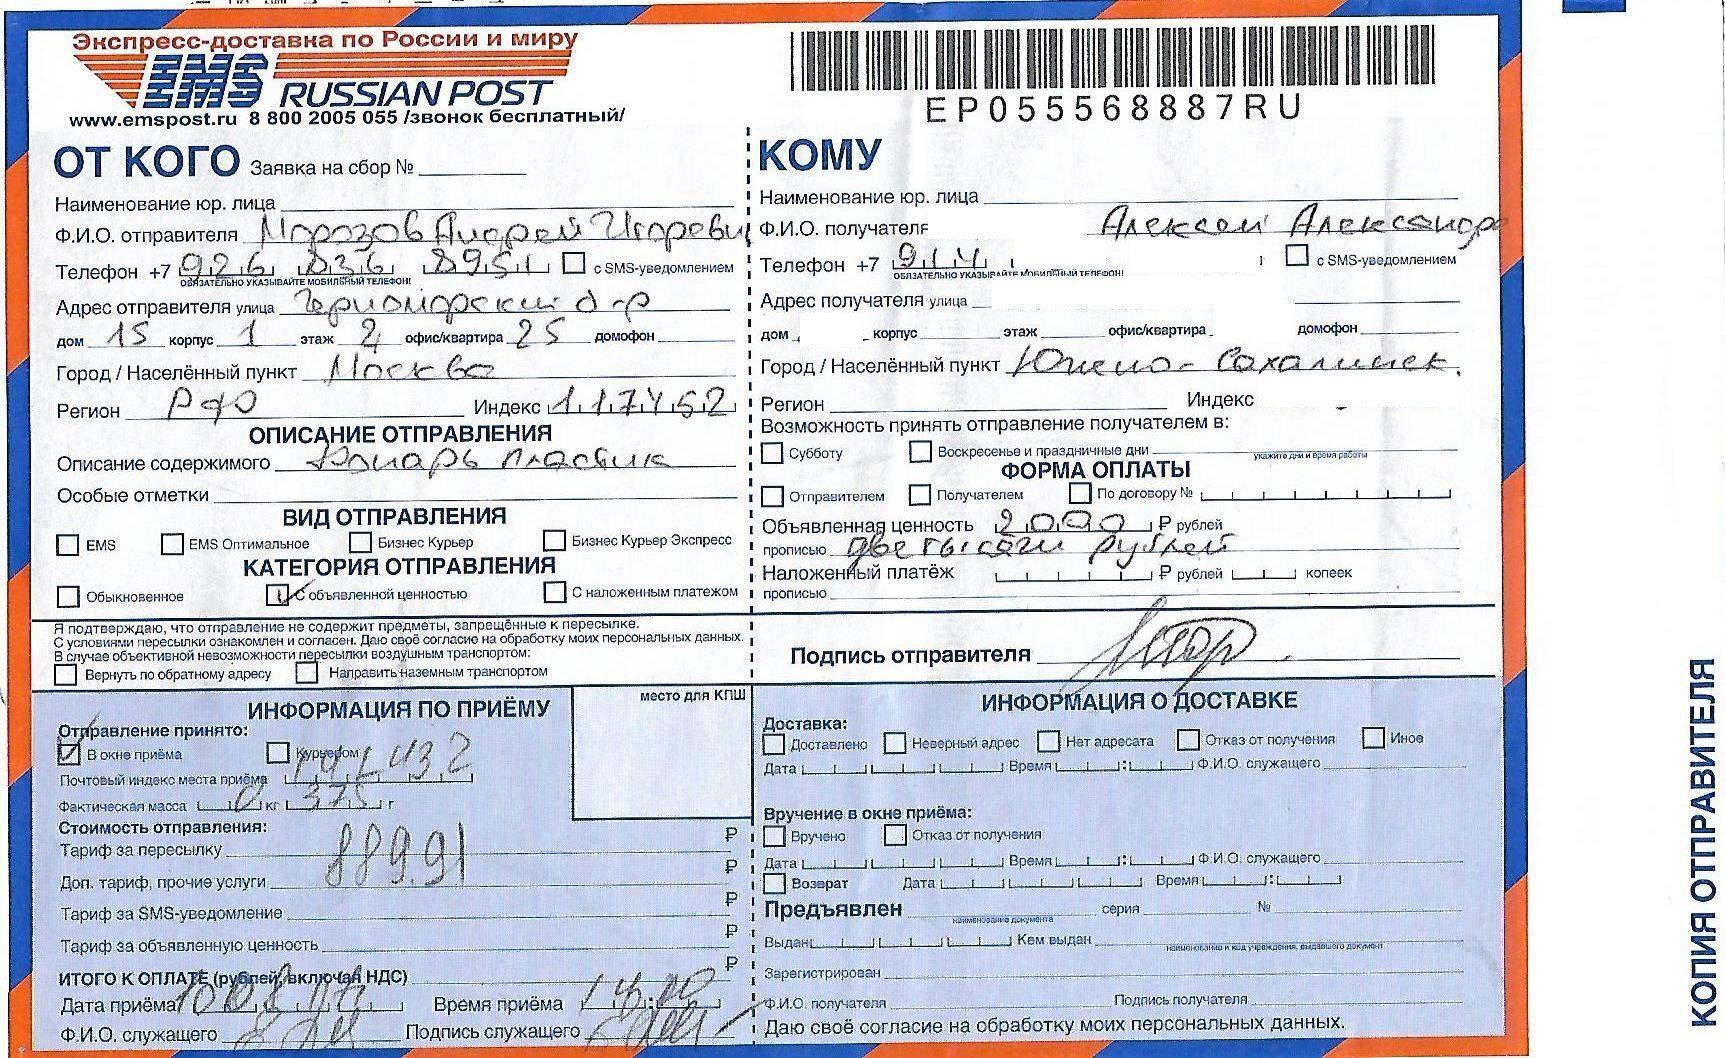 Проверка статуса посылки ems